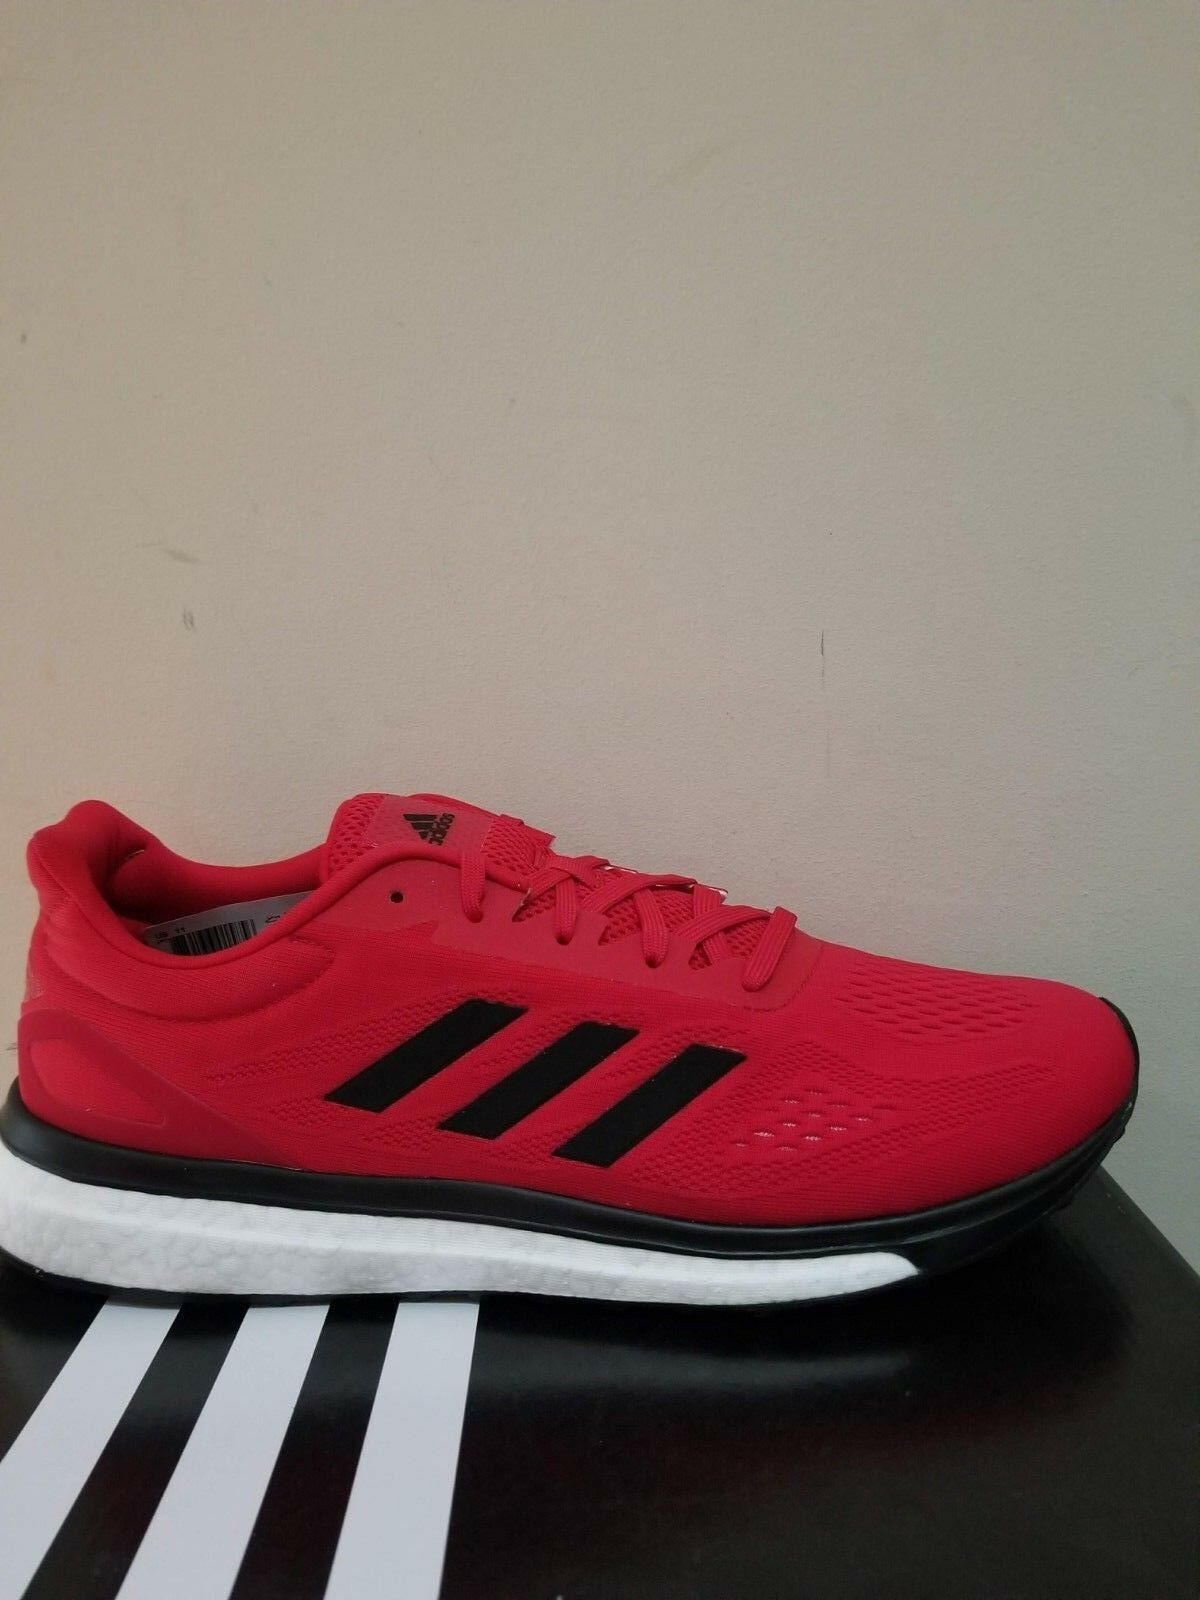 Adidas Response Response Response Lt Running Scarpe da Ginnastica Taglia 11 Nib | Nuovo design diverso  04905e